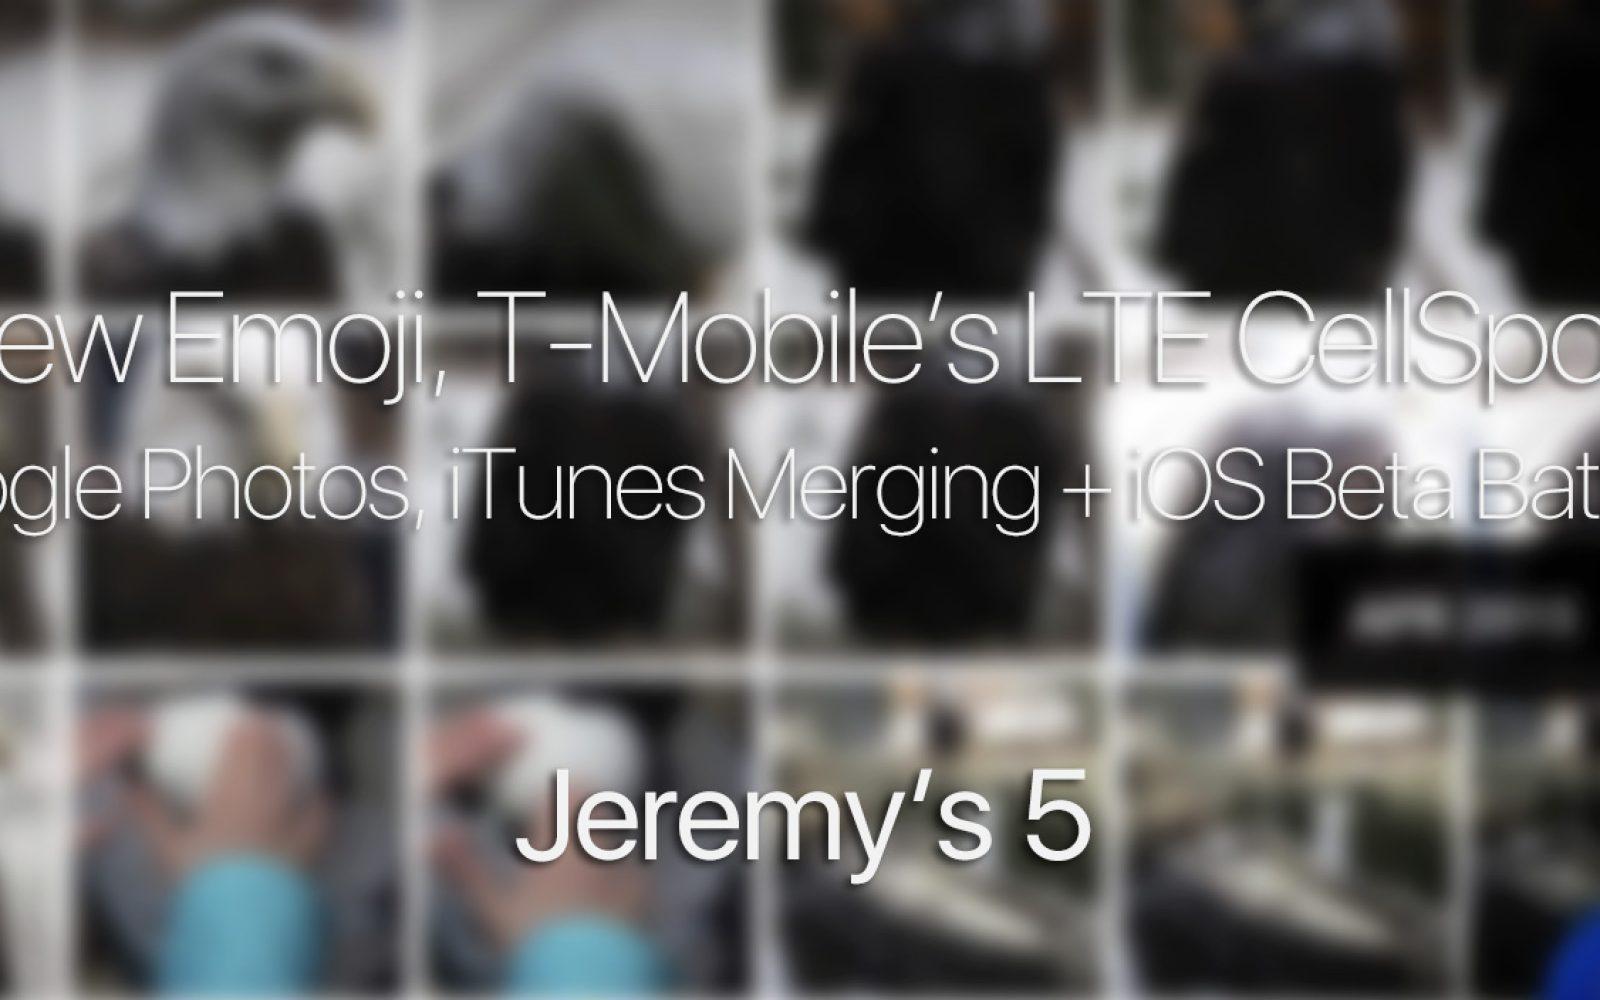 Jeremy's 5: New emoji, T-Mobile LTE CellSpot, Google Photos